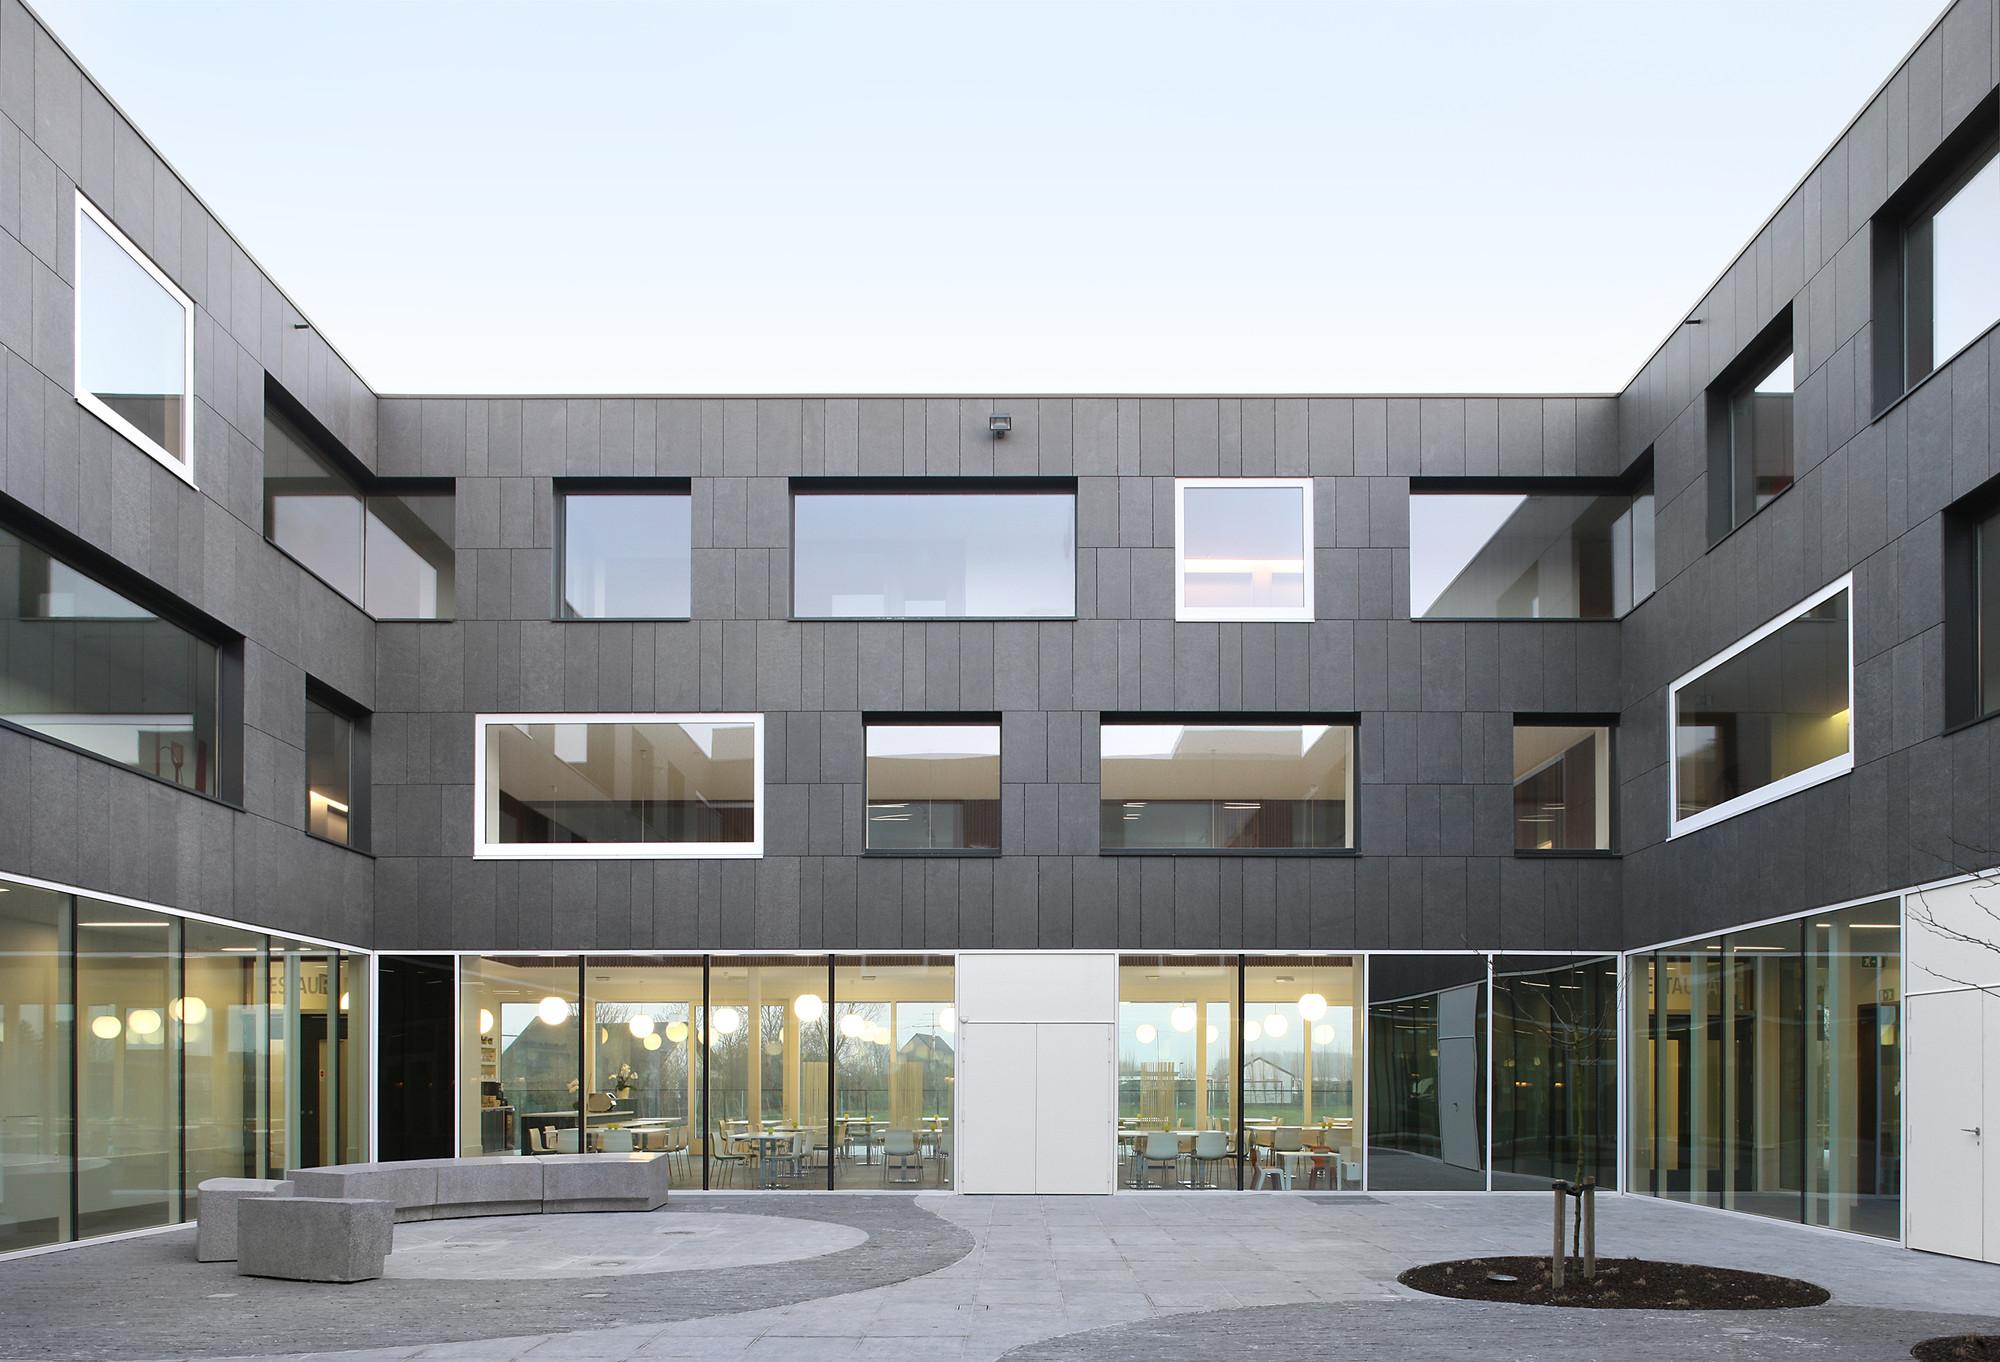 Carehotel Middelpunt / Architectuuratelier Dertien12, © Filip Dujardin